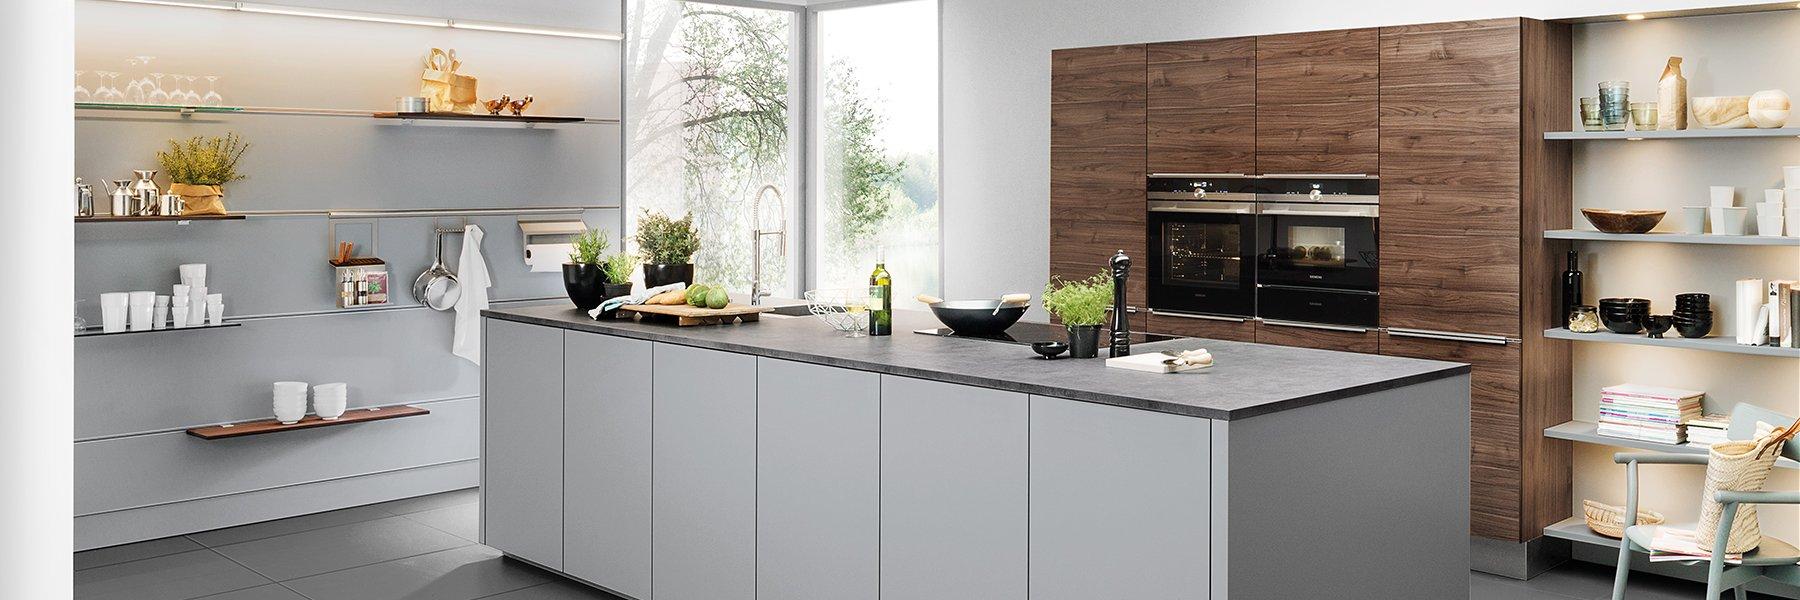 Grundig Die Kücheninsel In Ostseeheilbad Ahlbeck Usedom